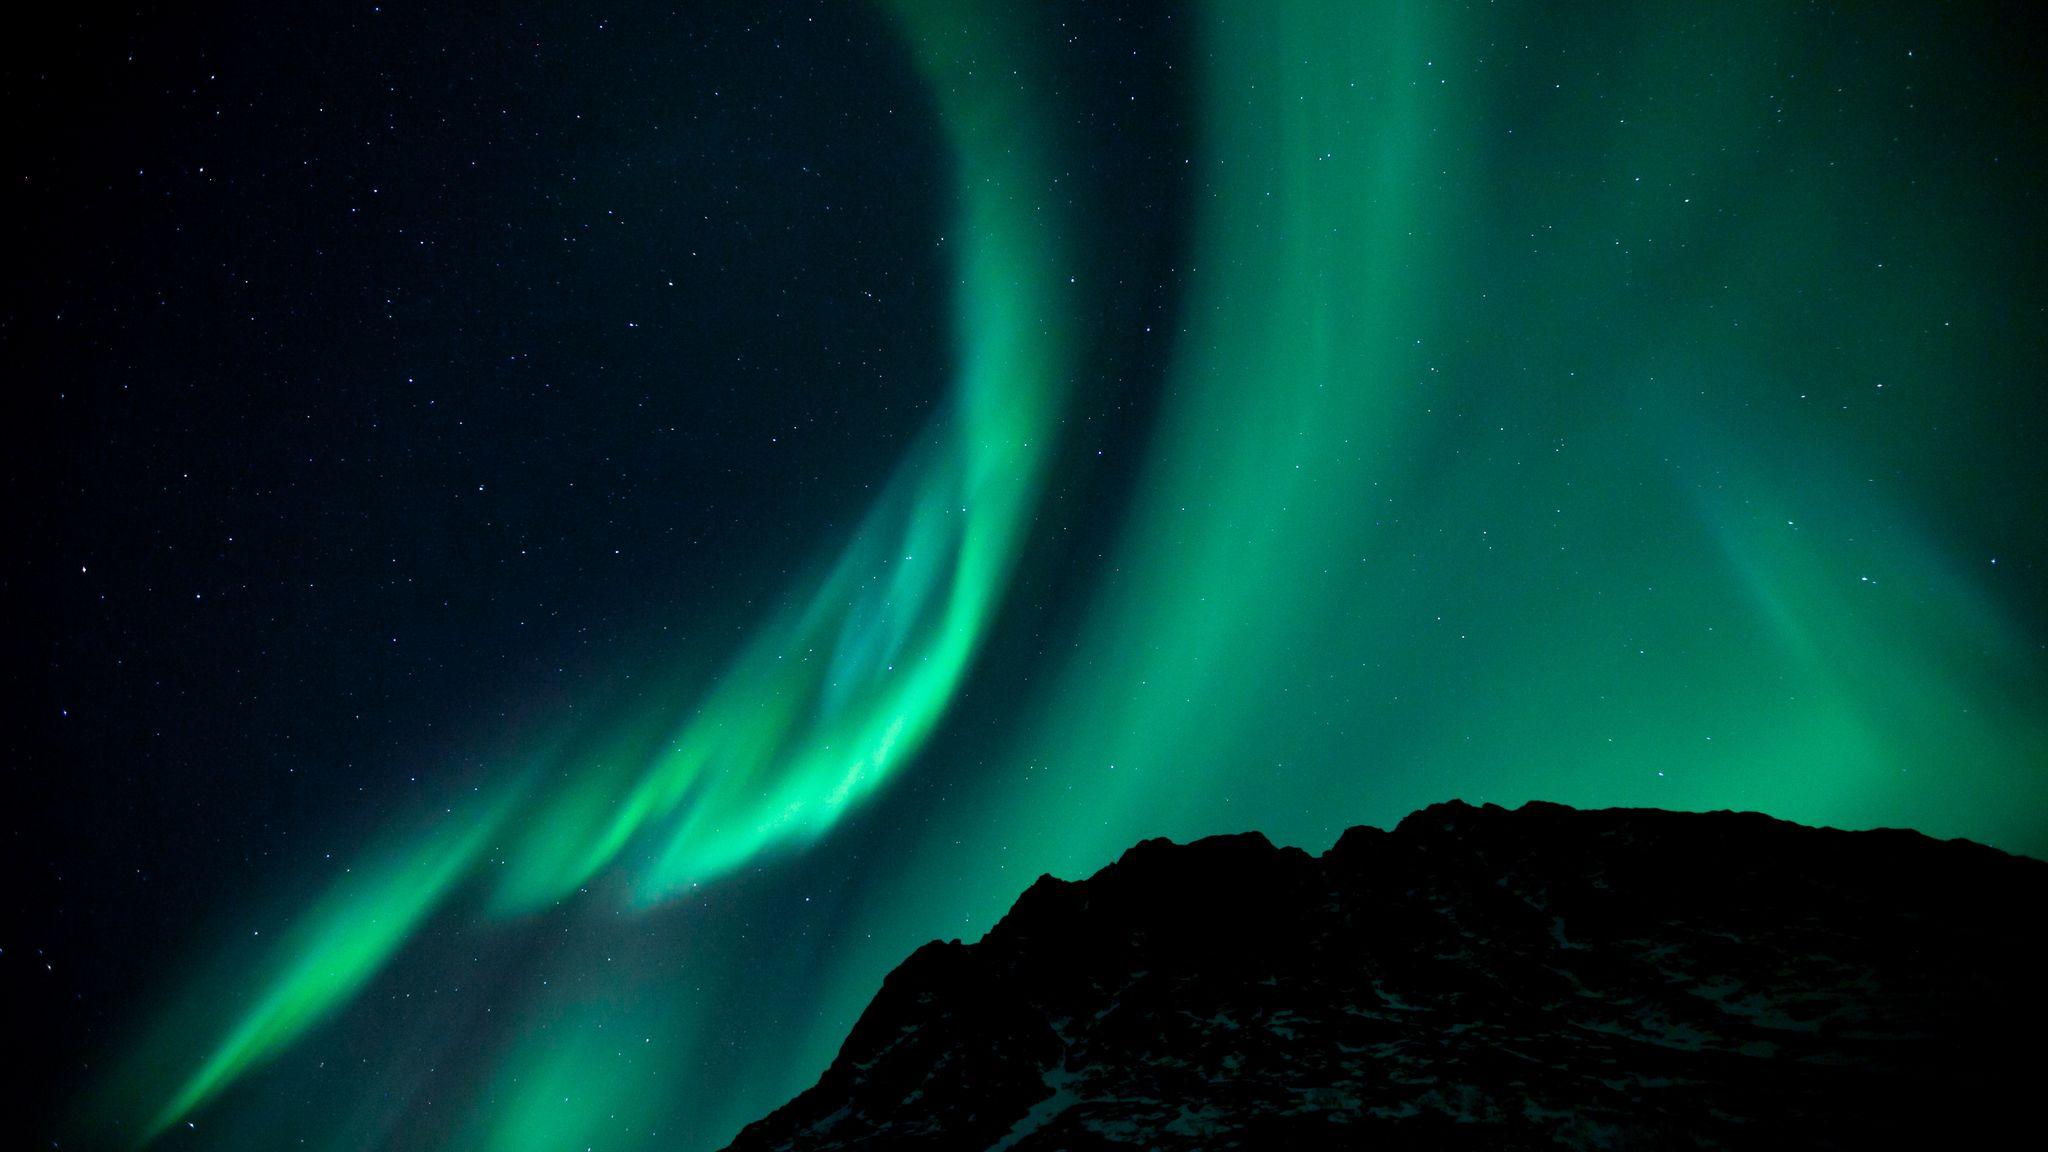 2048x1152 Wallpaper northern lights, night, night sky, phenomenon